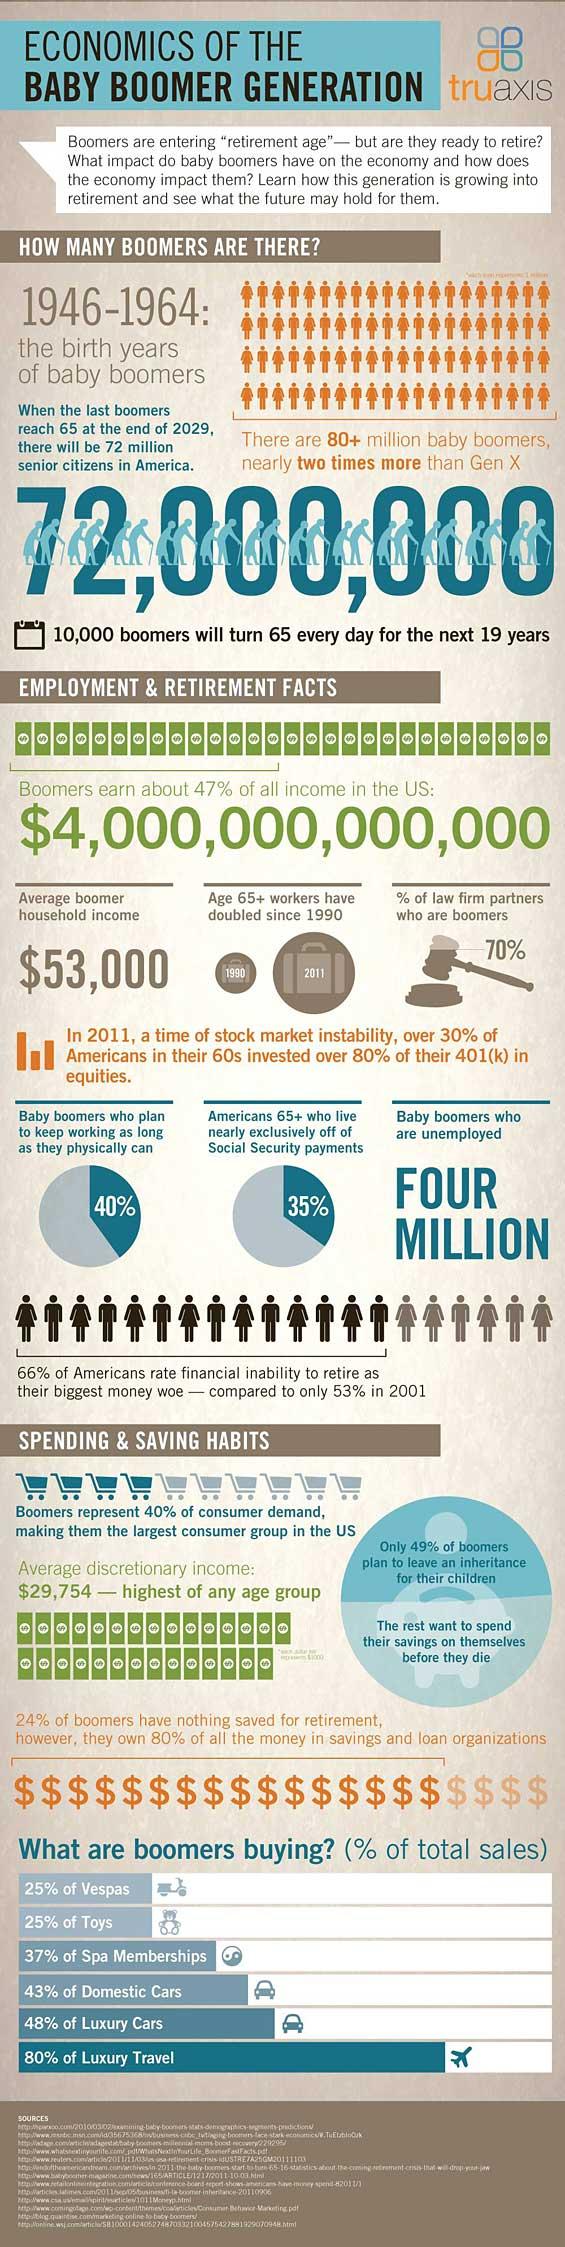 Infographic: The Economics of Baby Boomers